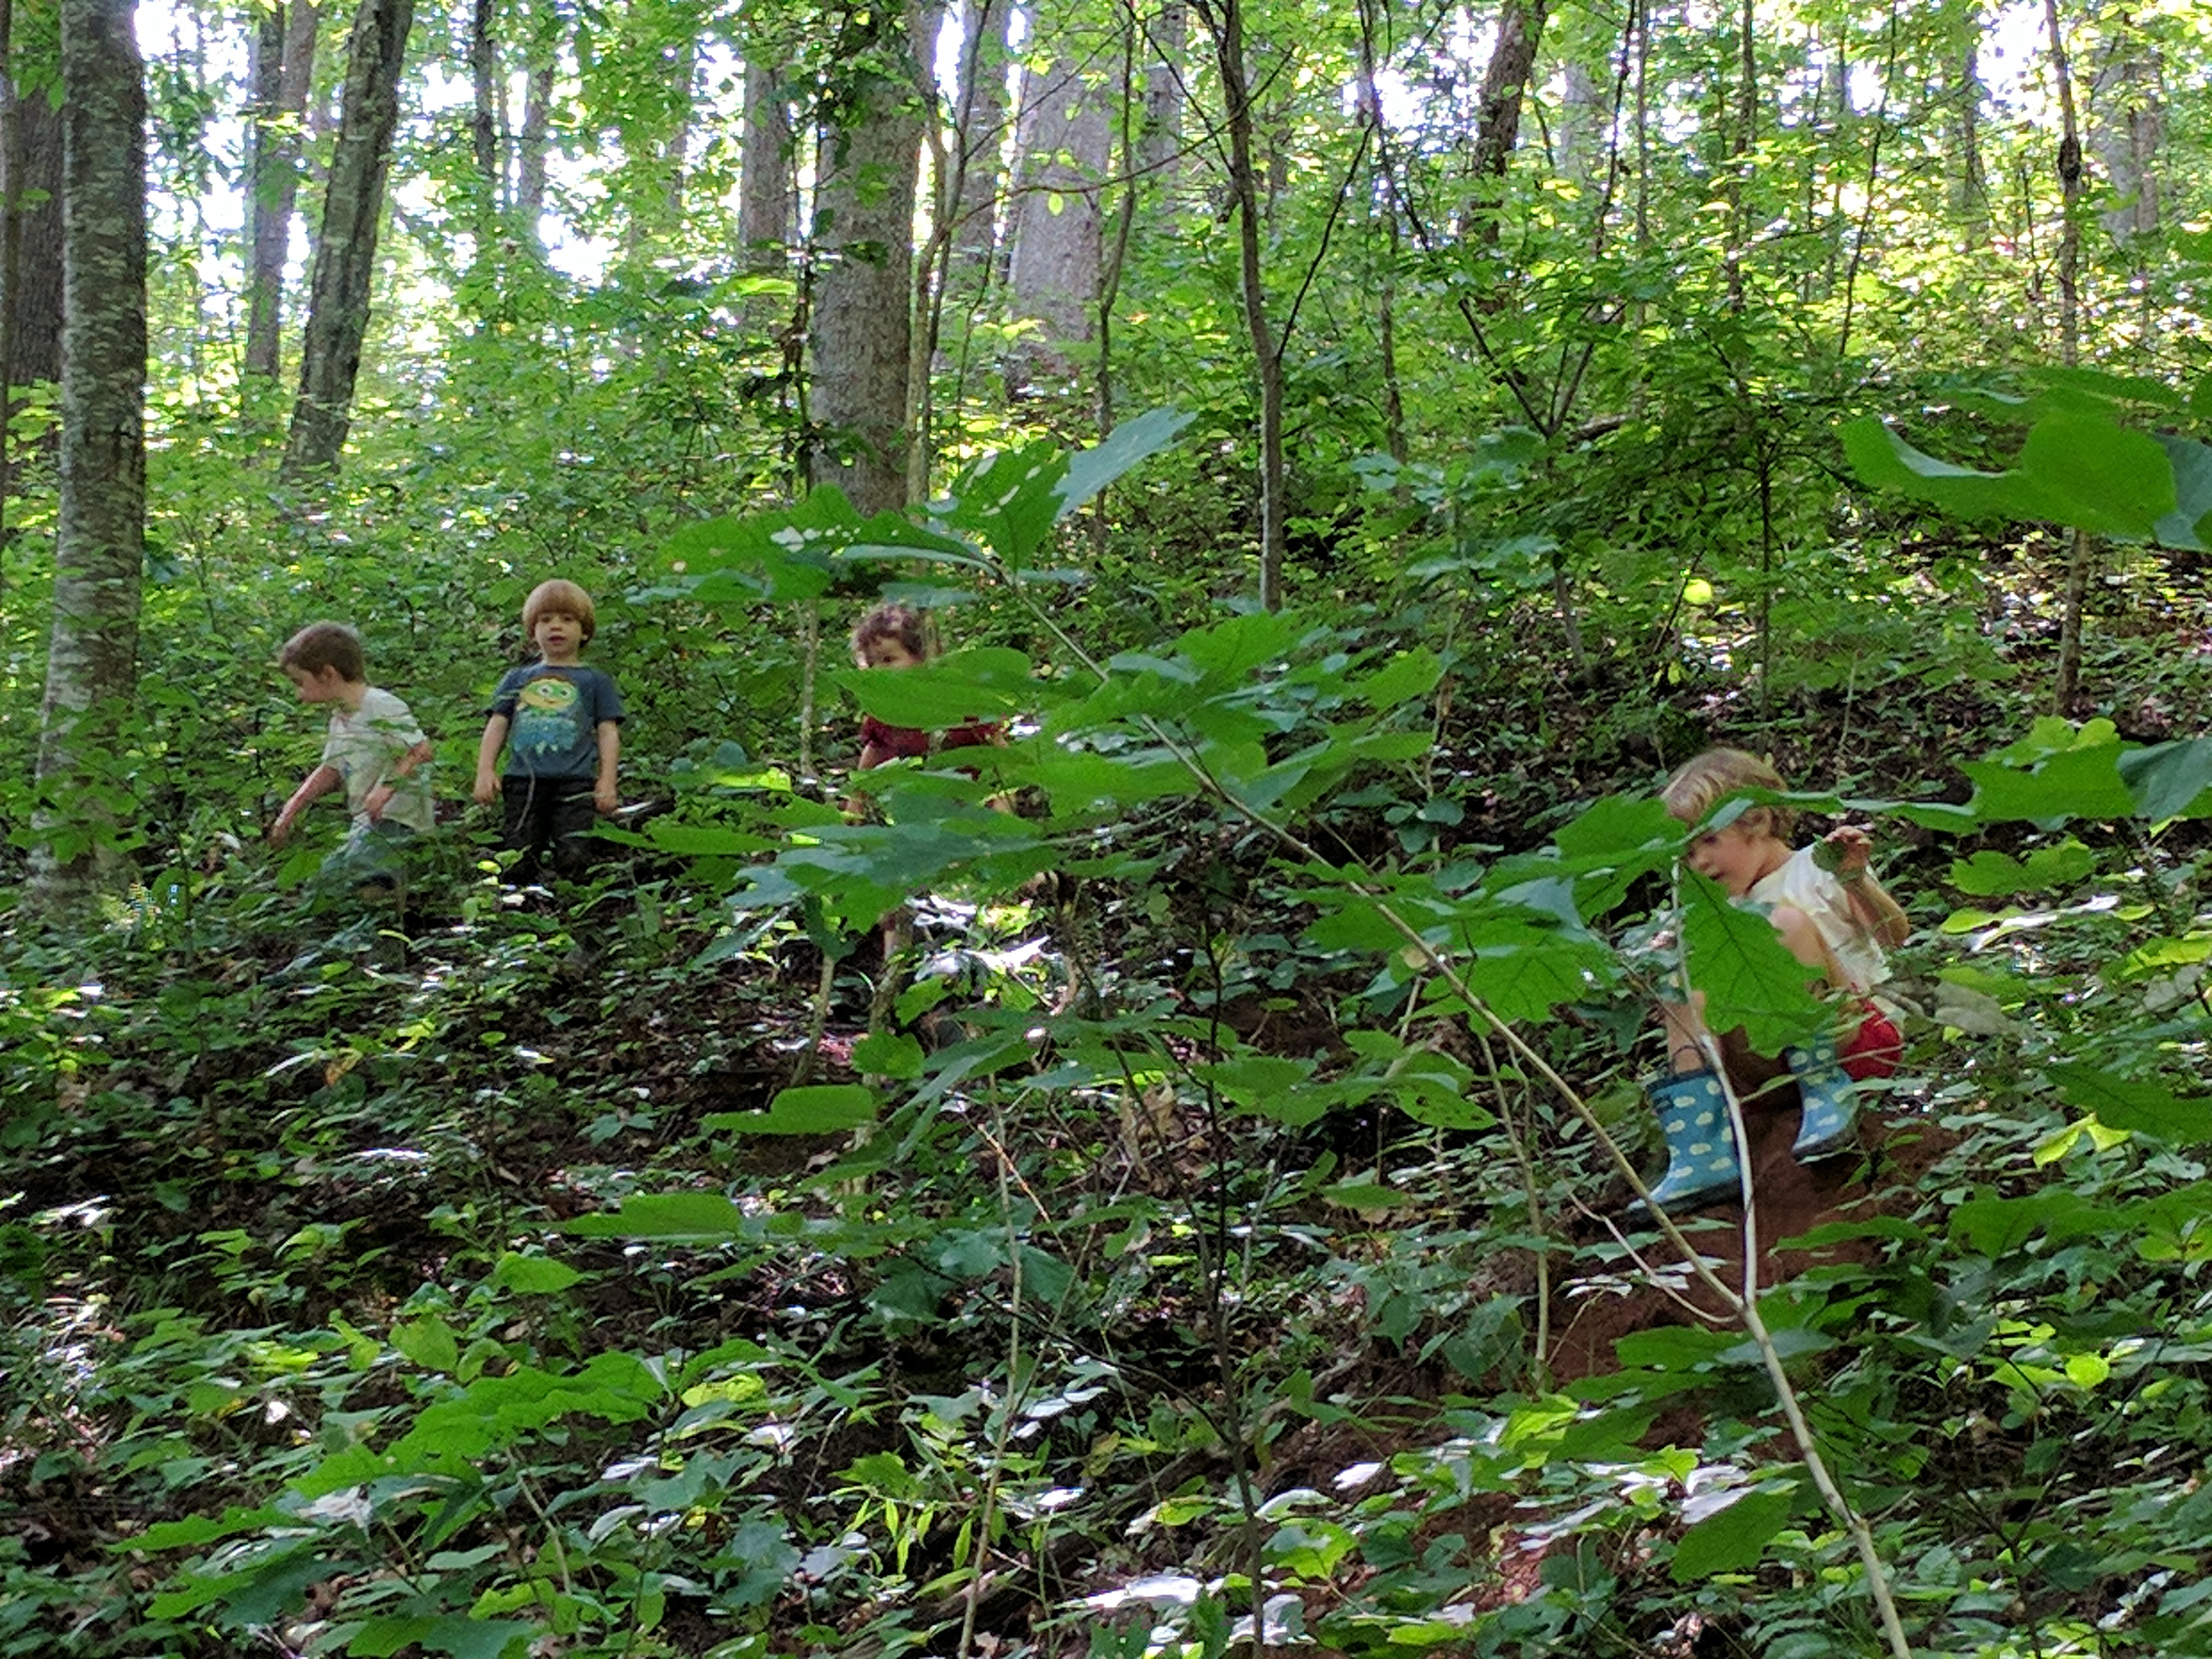 Ashevillefarmstead-kids-Sprouts-forest